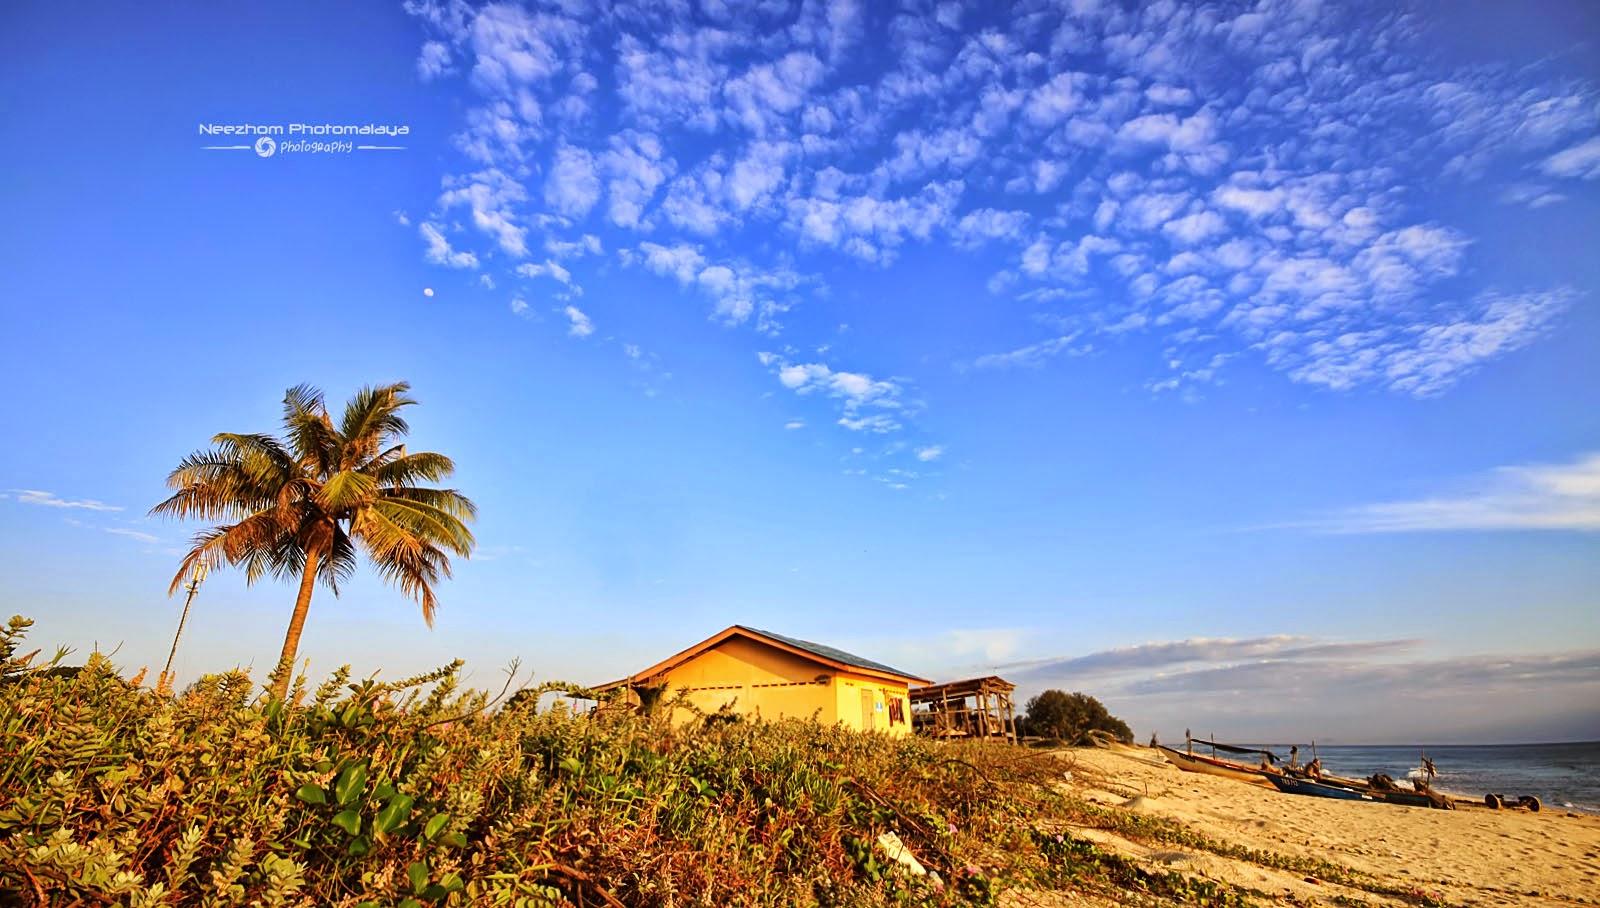 Rumah Kecil di tepi Pantai Kuala Ibai